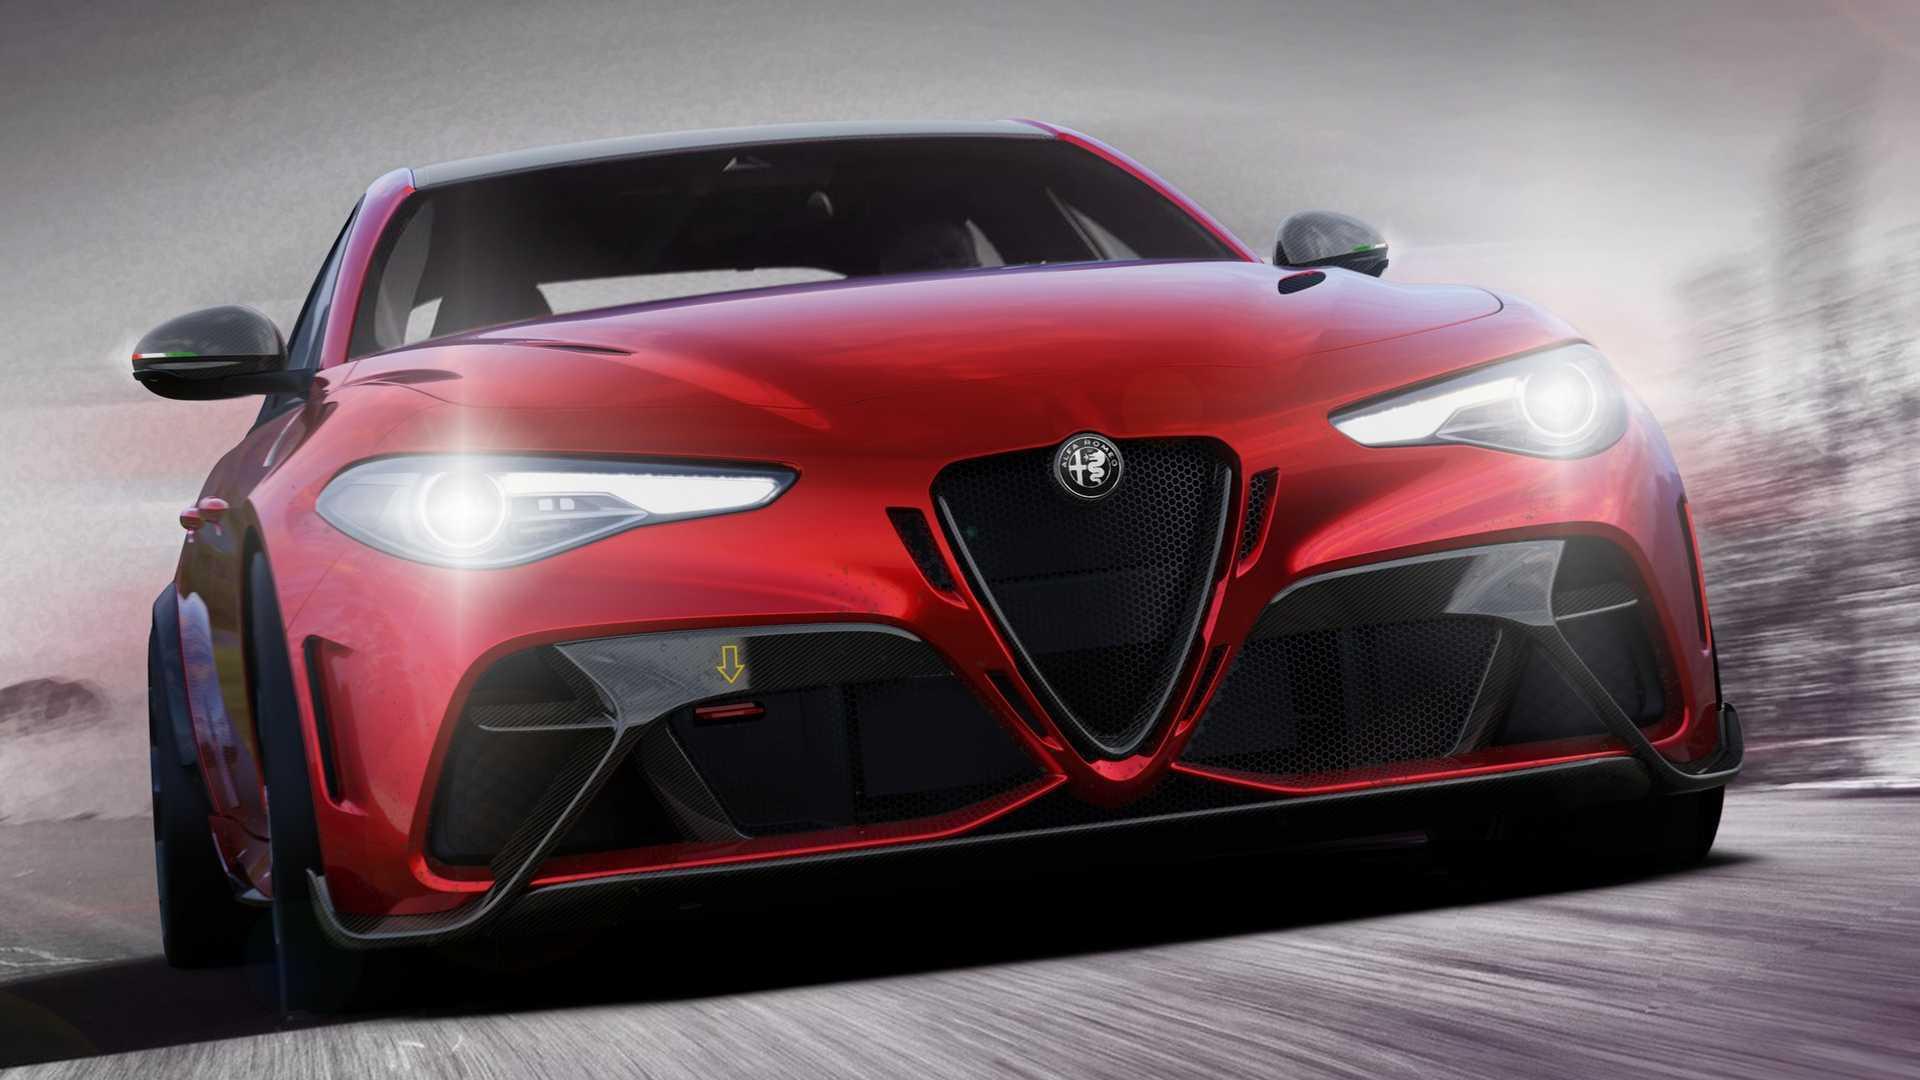 So, the GTA / GTAm, what do you guys think? | Alfa Romeo ...